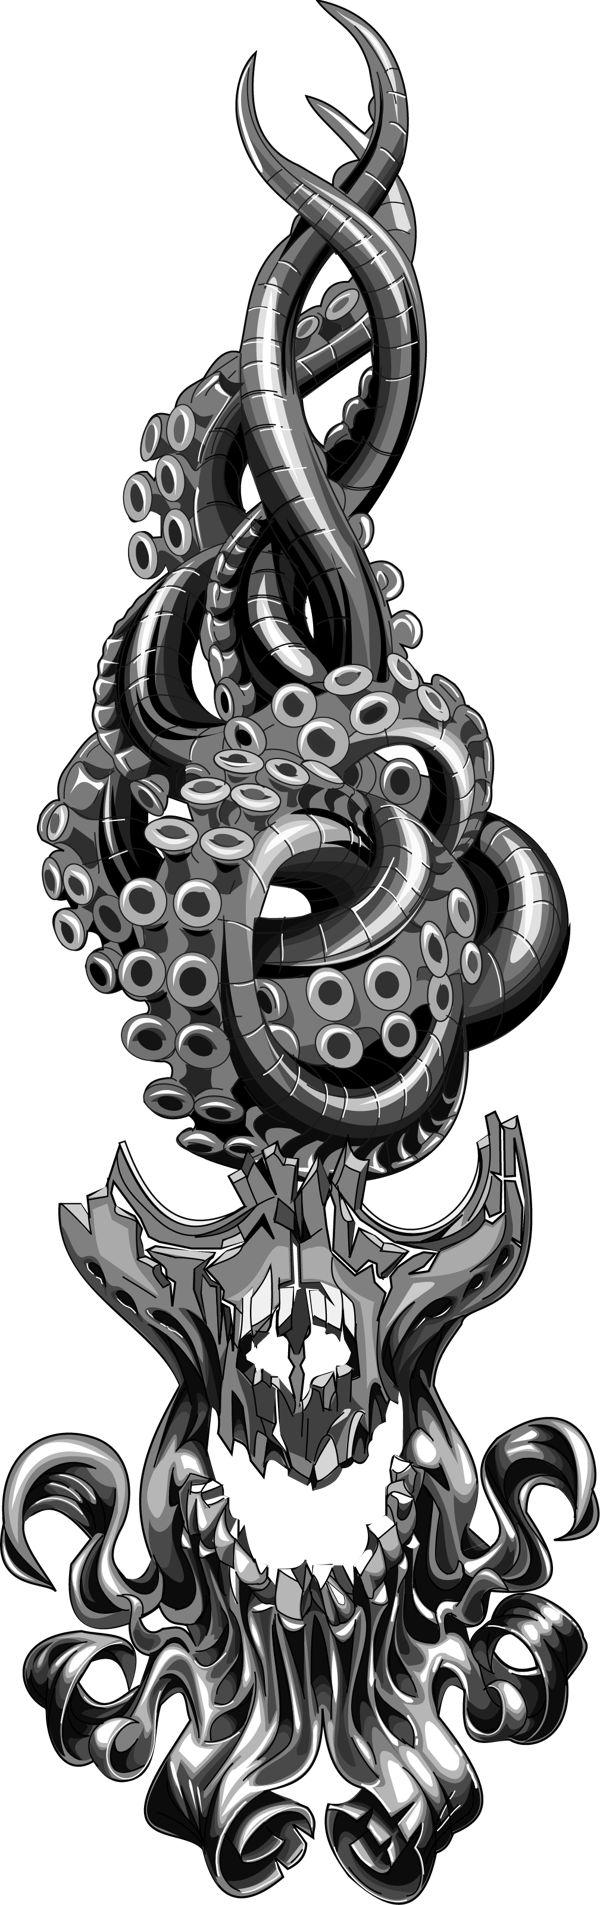 skull octopus flame area code on Behance